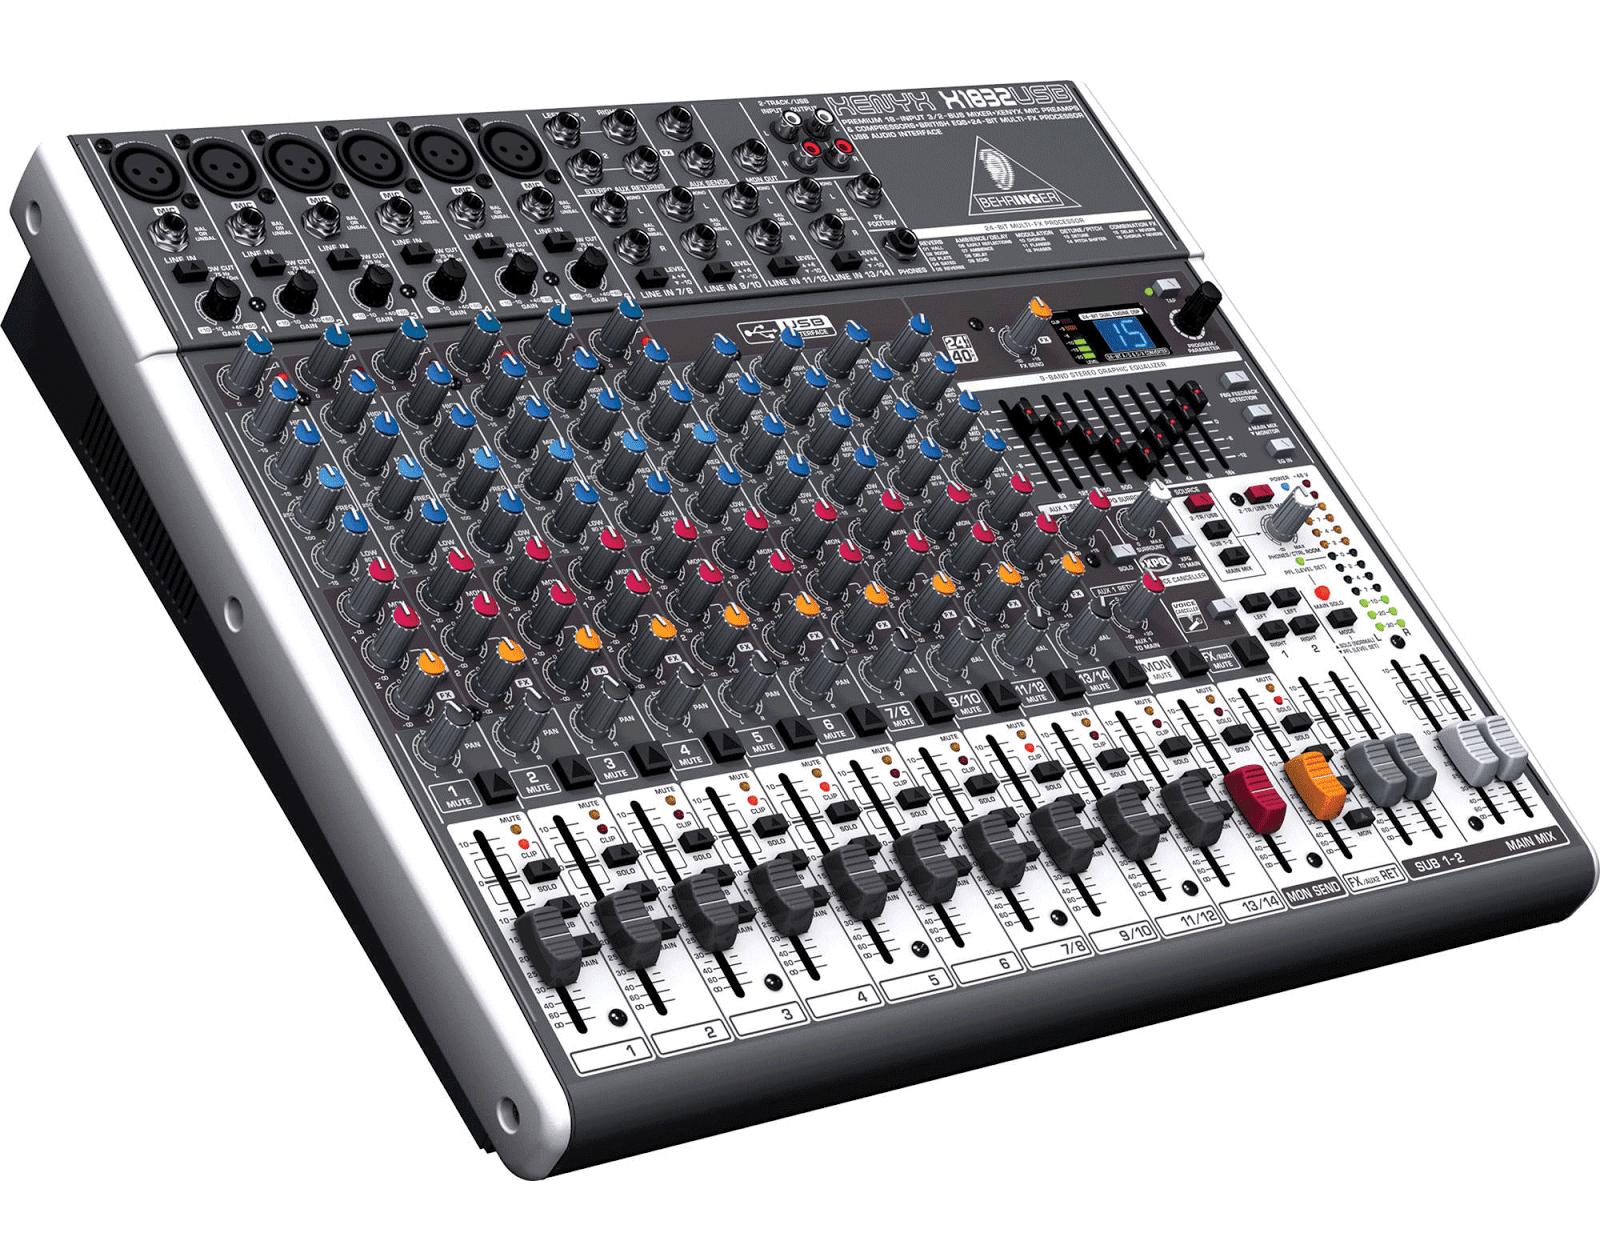 Harga Mixer Audio Behringer 6 Channel Monaural Dibawah 5 Juta